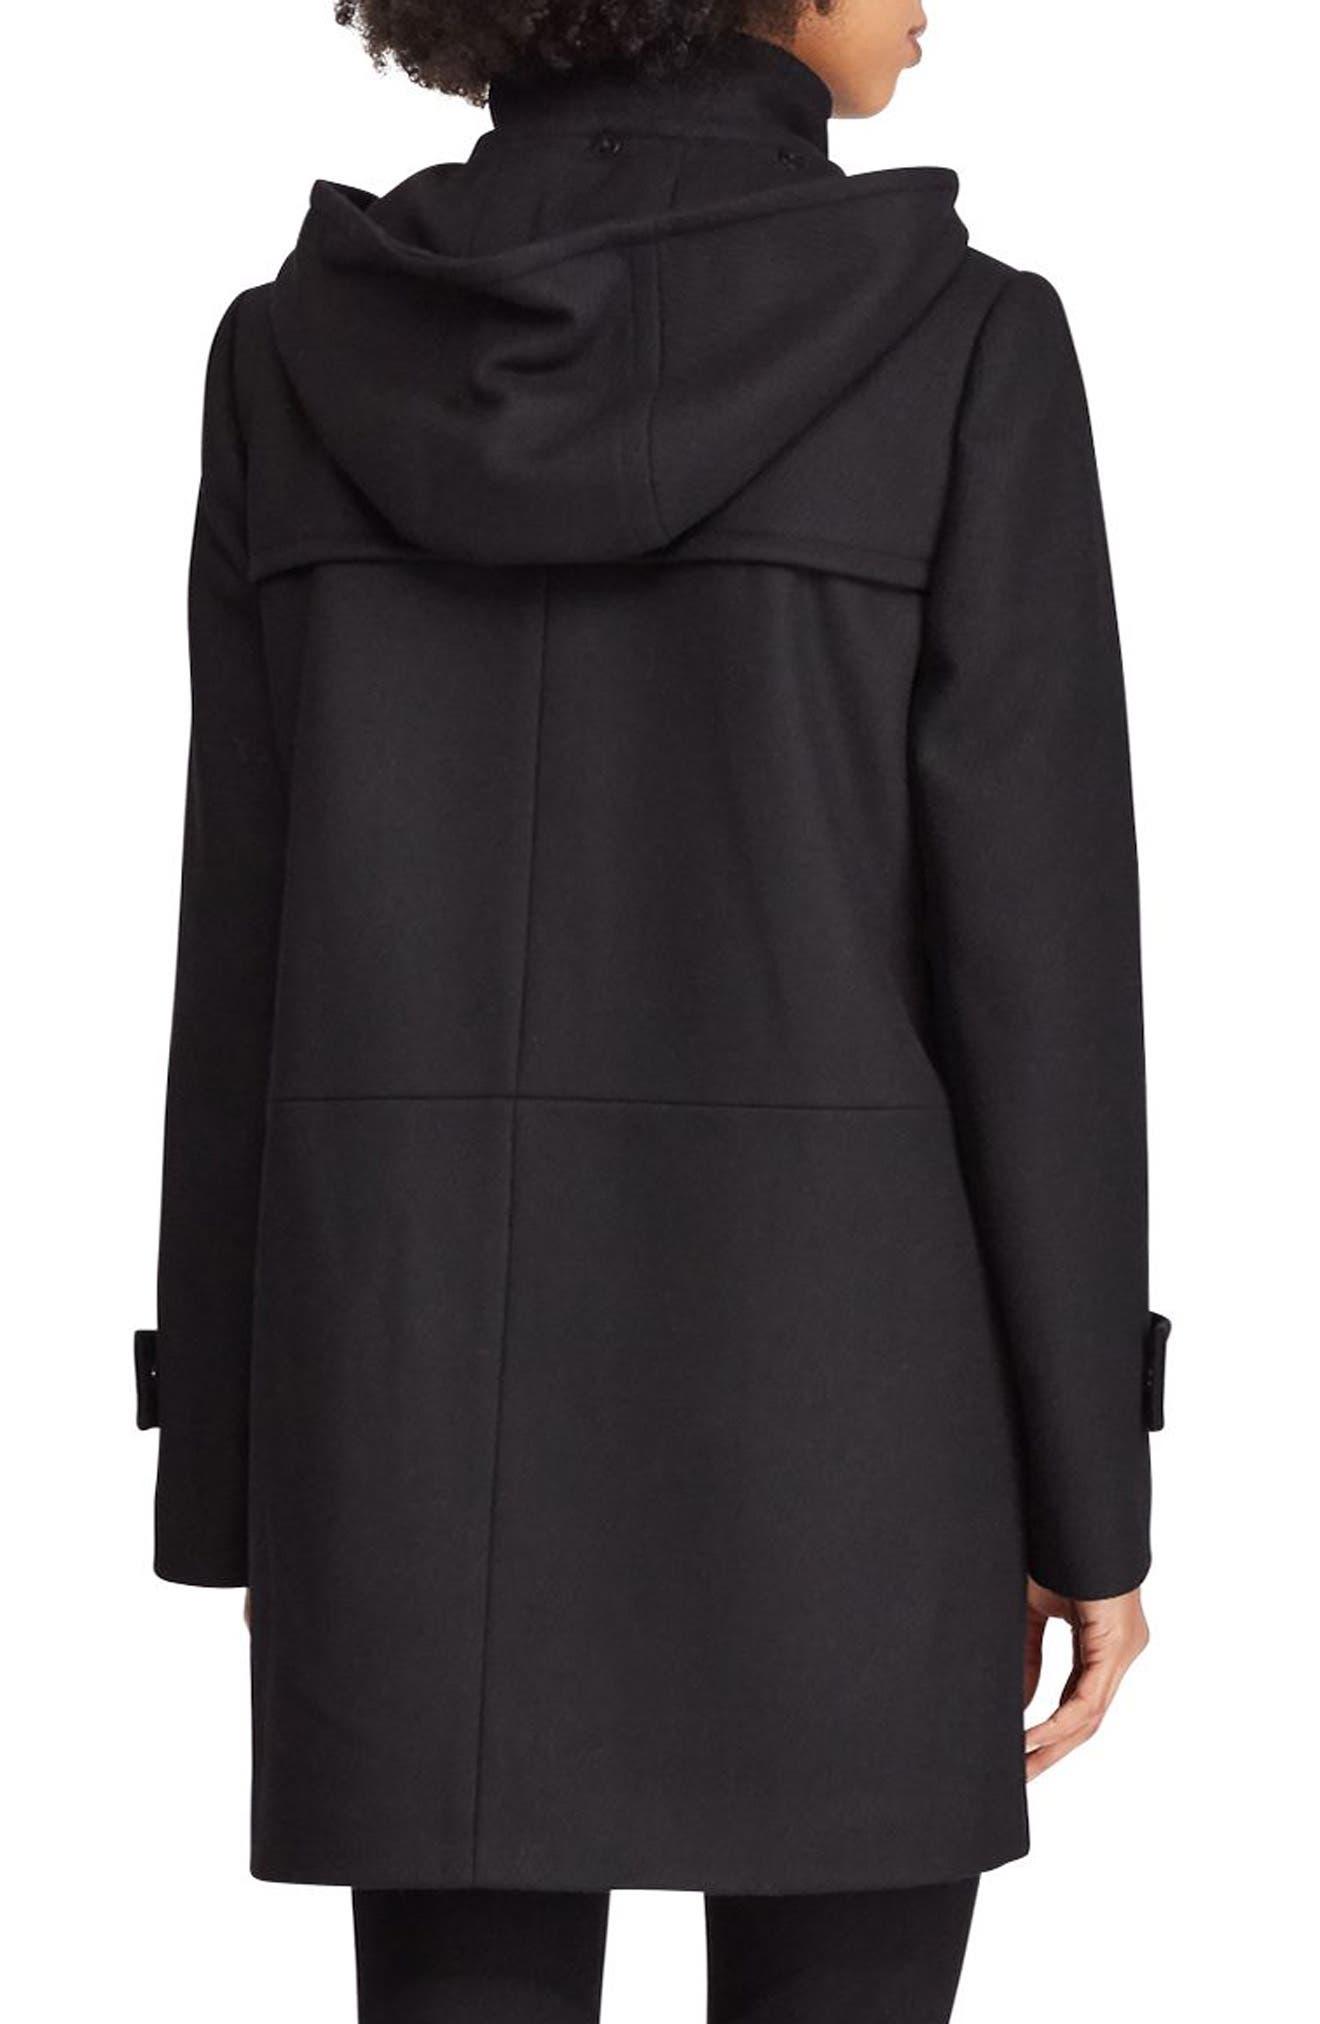 LAUREN RALPH LAUREN,                             Wool Blend Jacket,                             Alternate thumbnail 2, color,                             BLACK